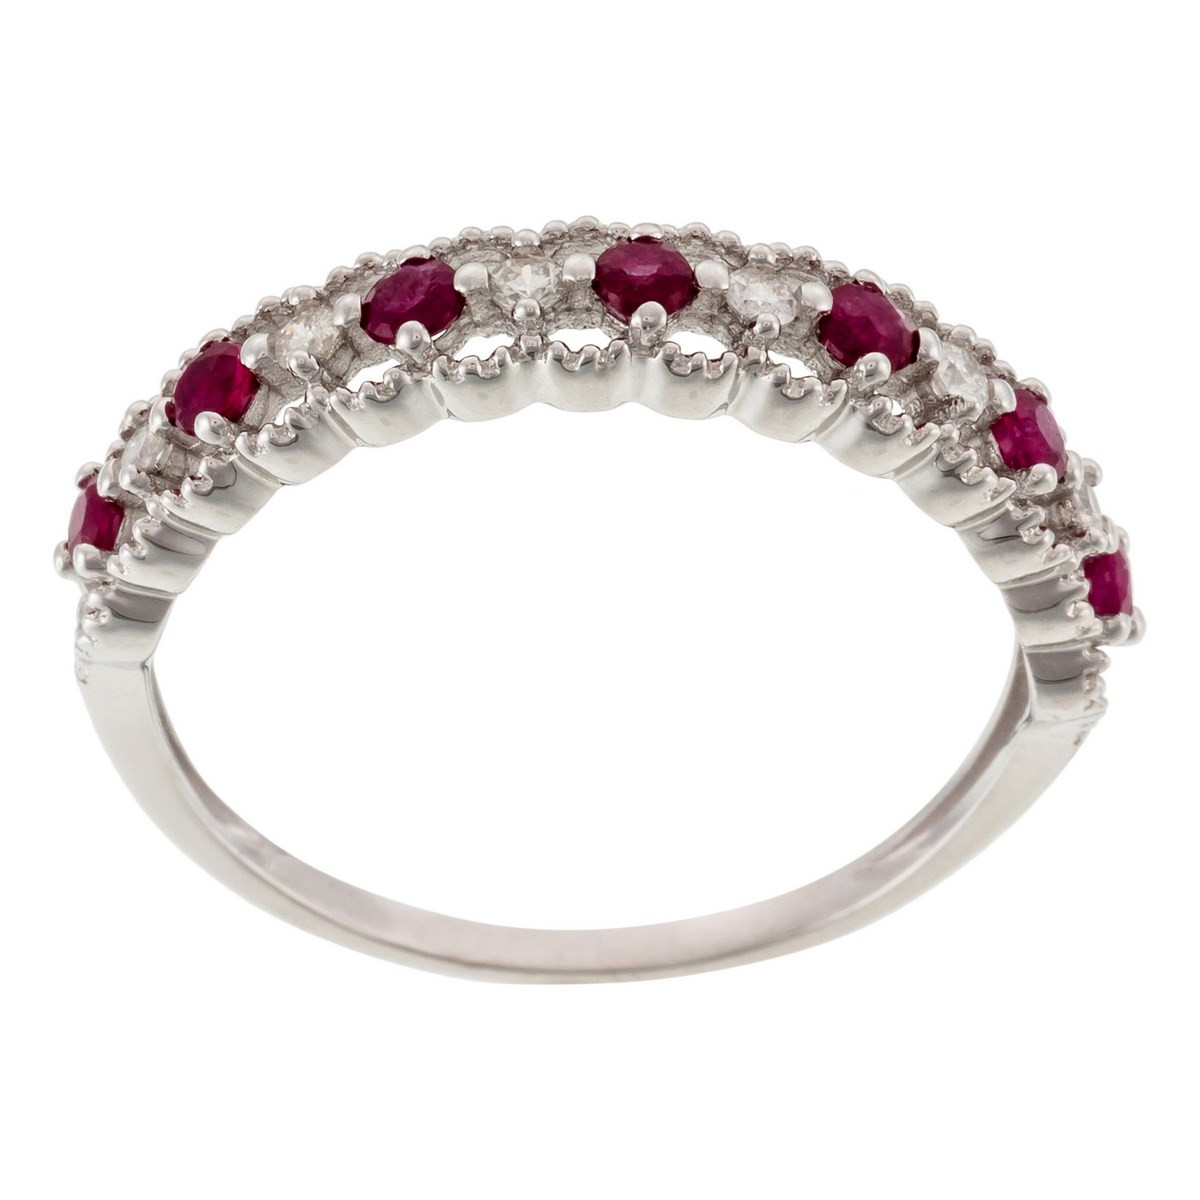 "Bague Or Blanc ""KOH SAMUI"" Diamants 0,09 carat et Rubis 0,39 carat"